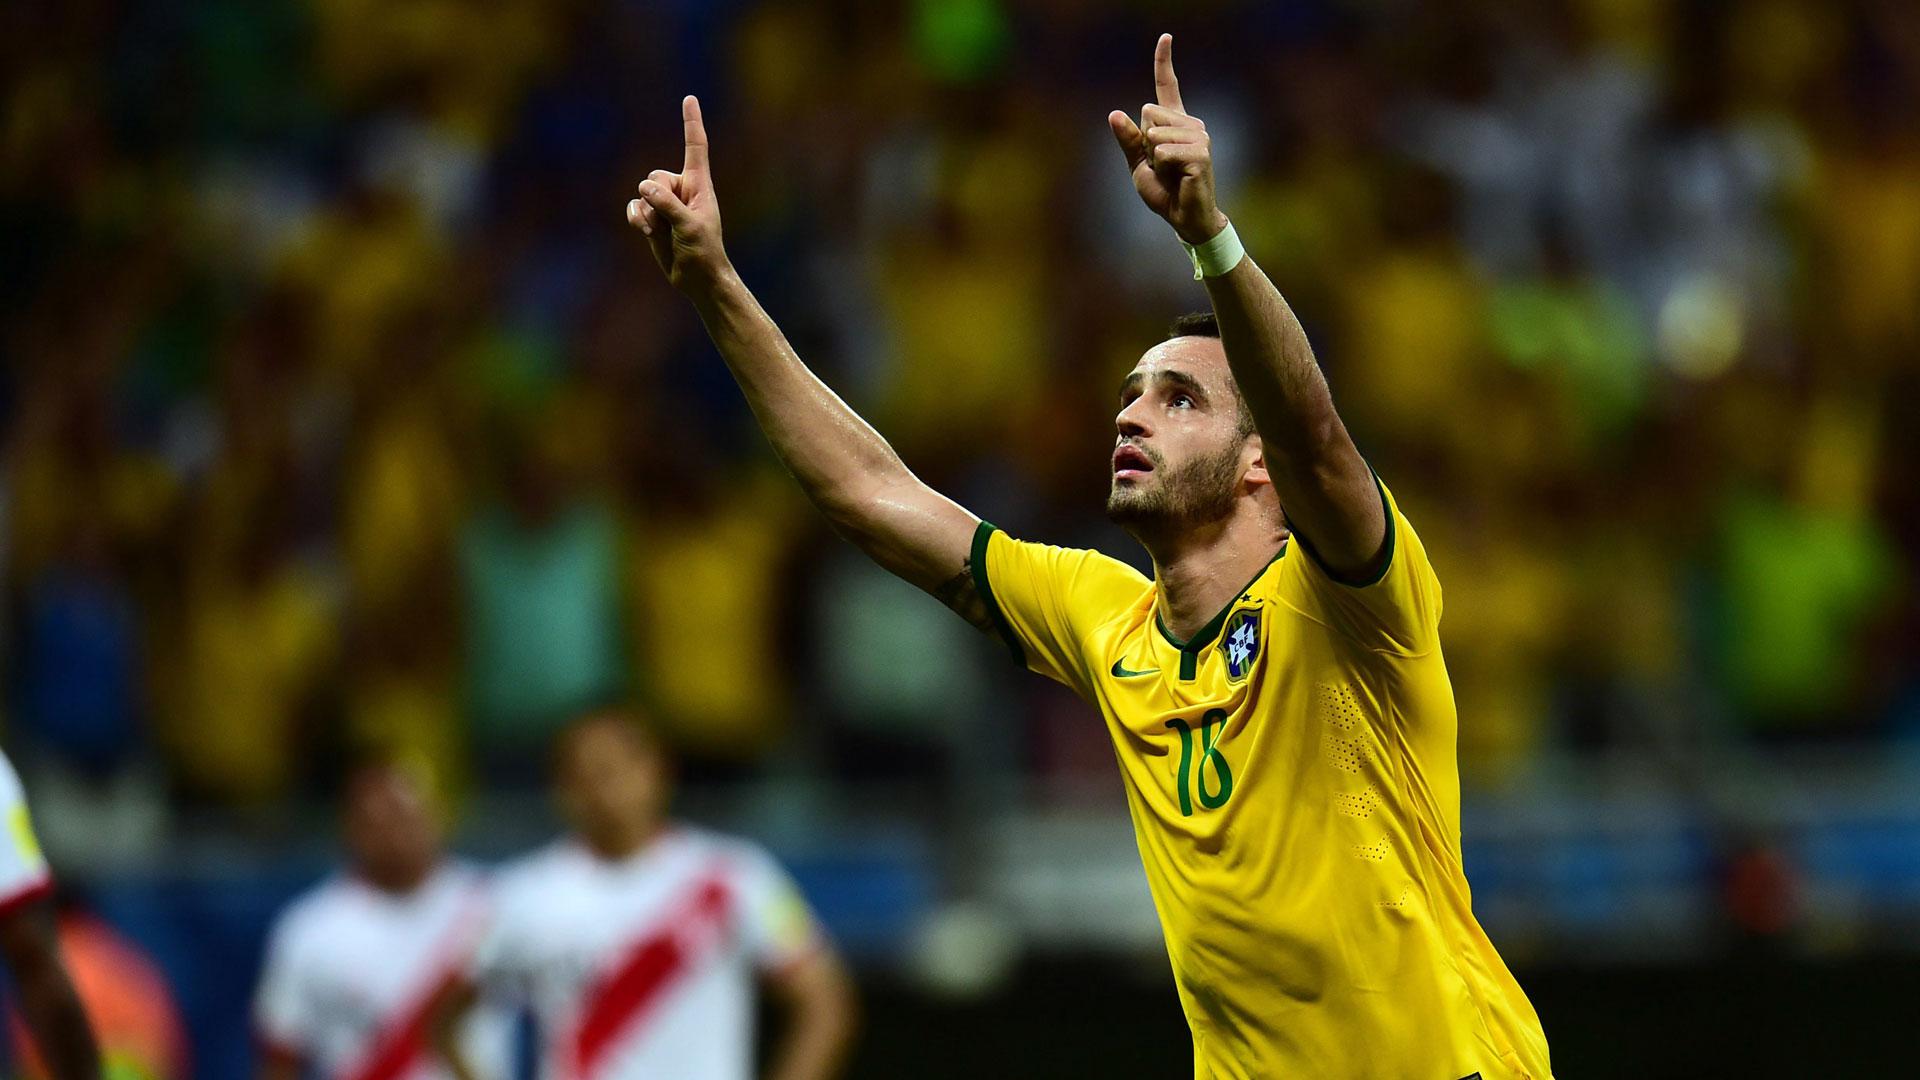 Gabriel Jesus, Neymar team up as Brazil beats Ecuador 3-0